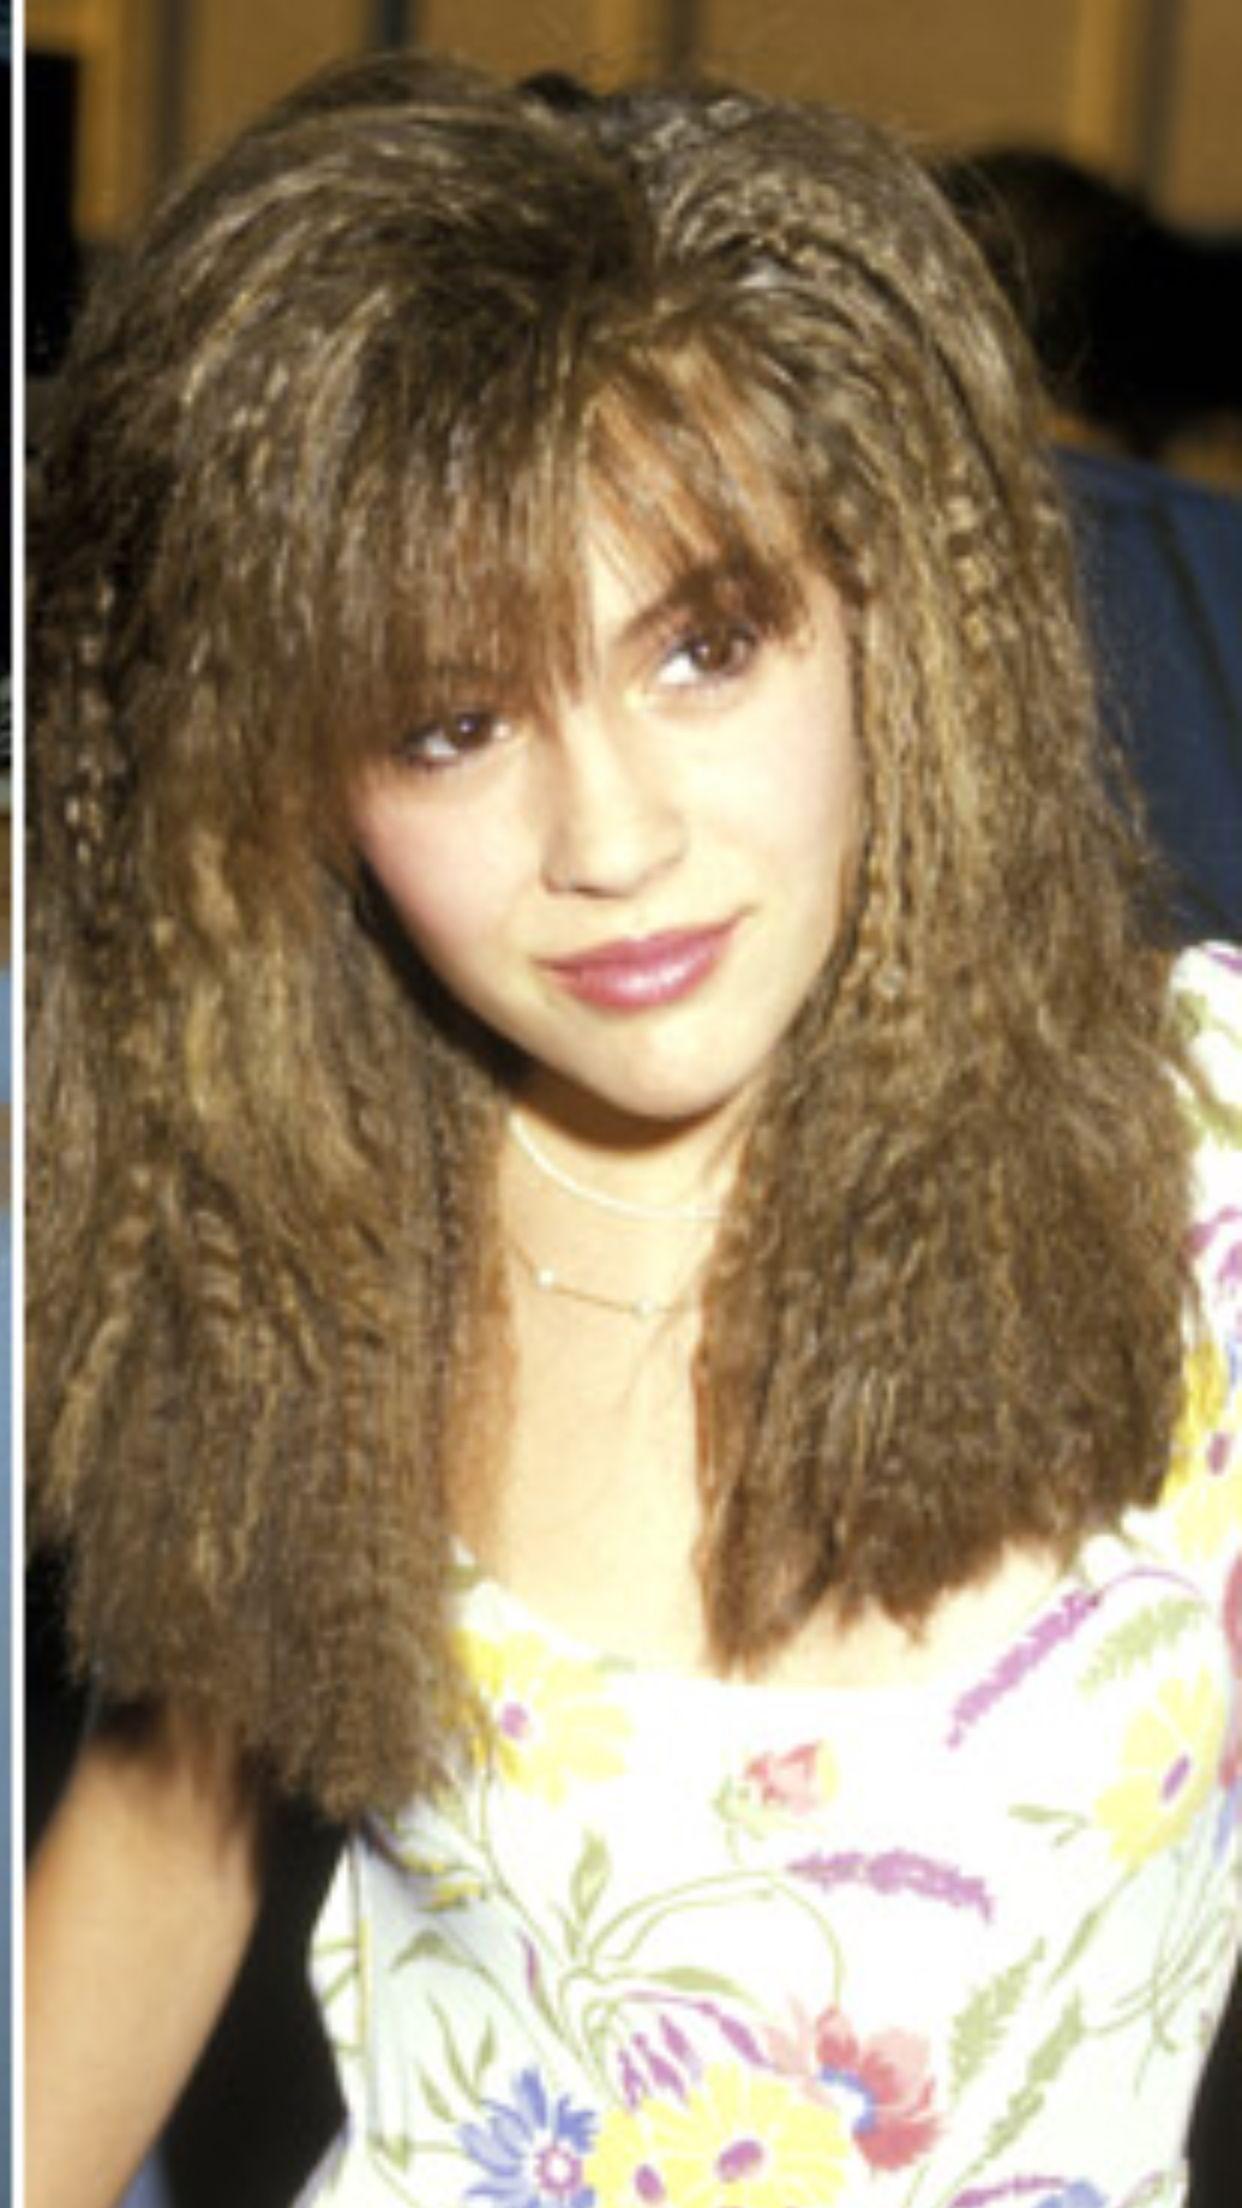 Alyssa Milano Alyssa Milano Hair Alyssa Milano Young 80s Hair